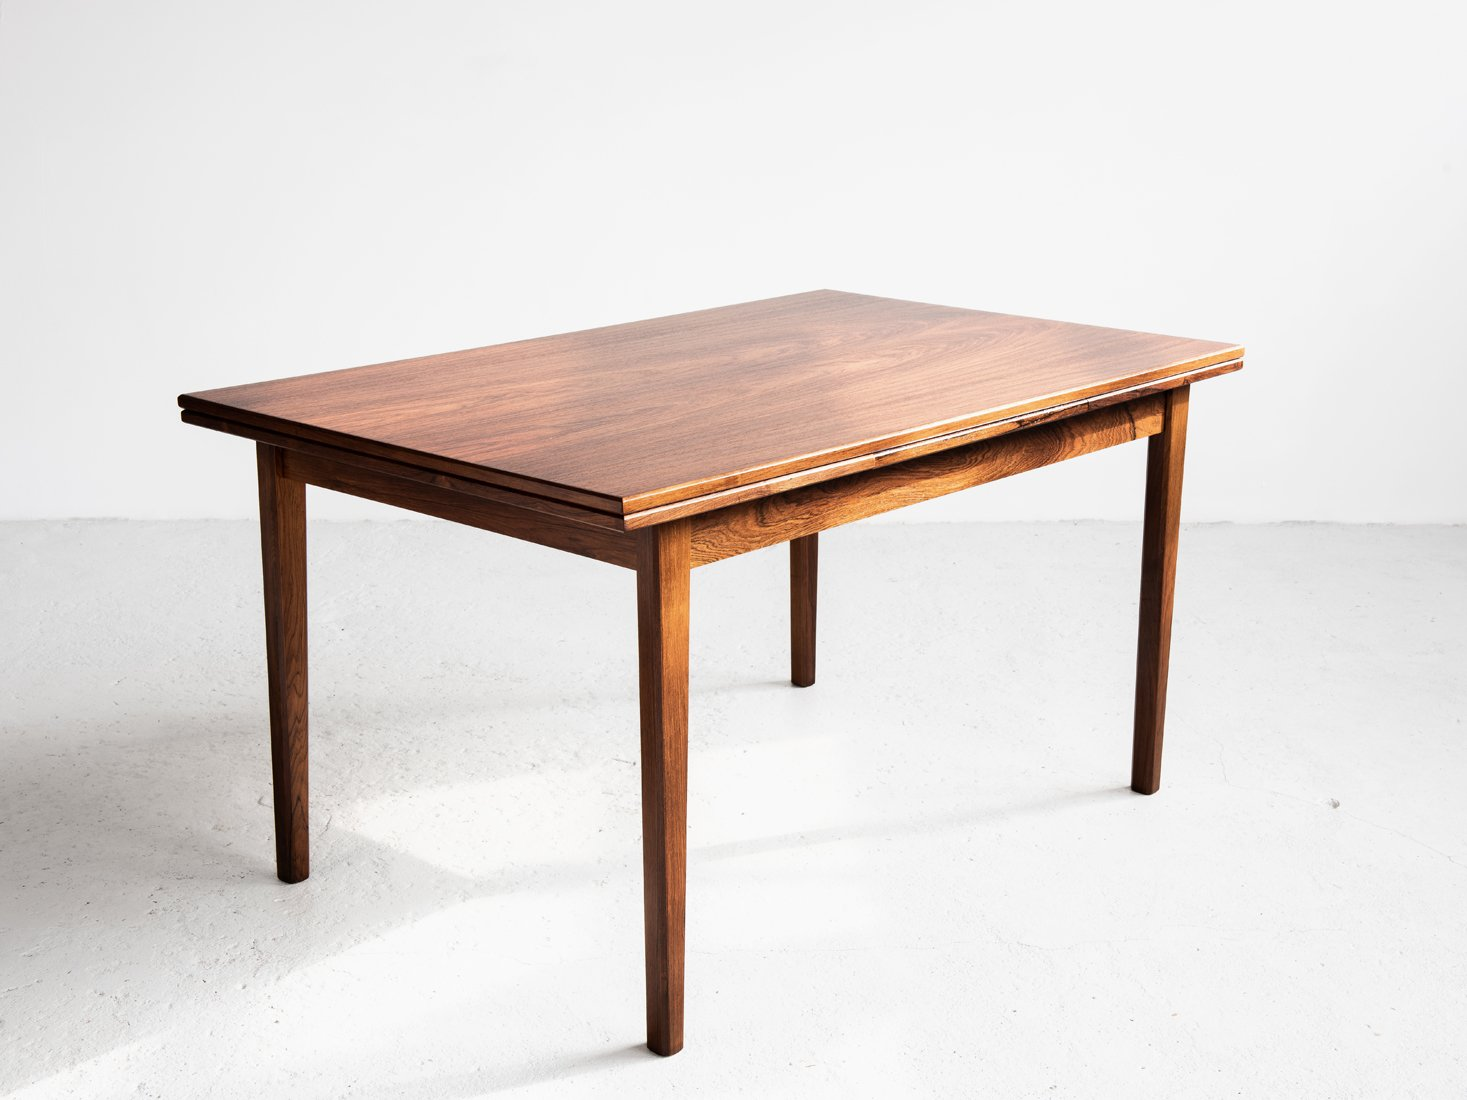 table de salle manger extensible mid century en palissandre danemark en vente sur pamono. Black Bedroom Furniture Sets. Home Design Ideas